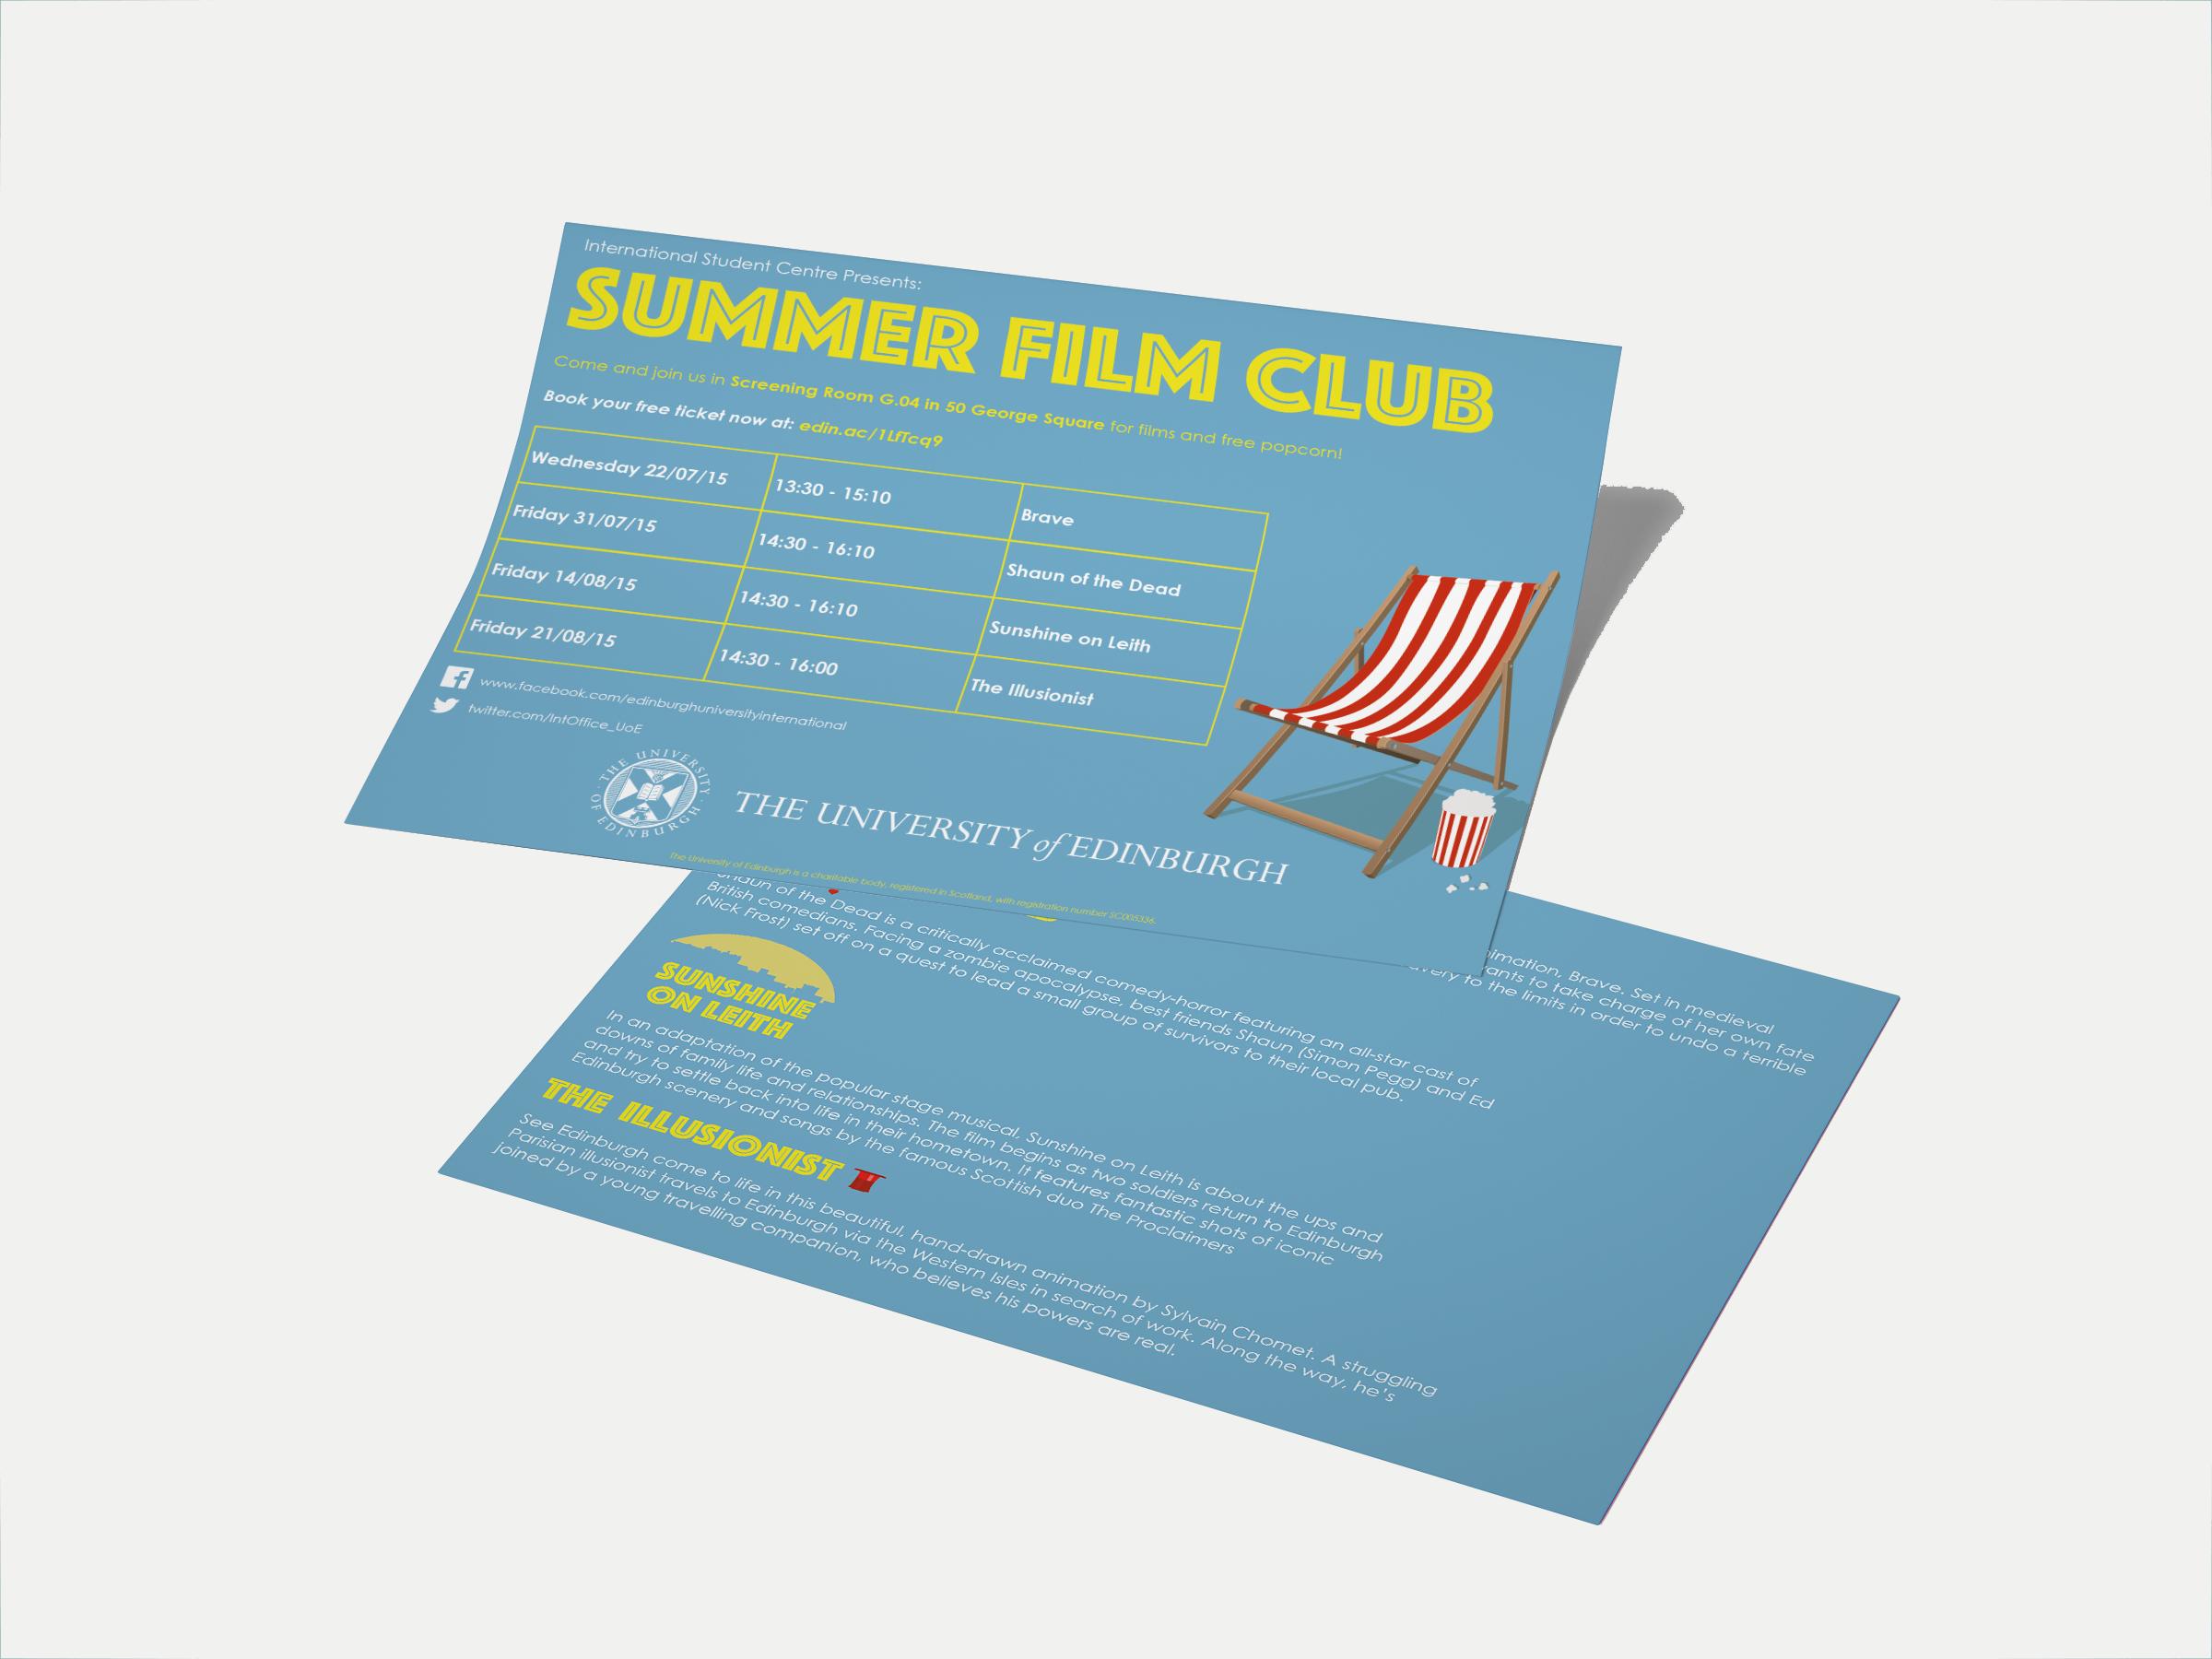 Summer Film Club - Claudia Baldacchino